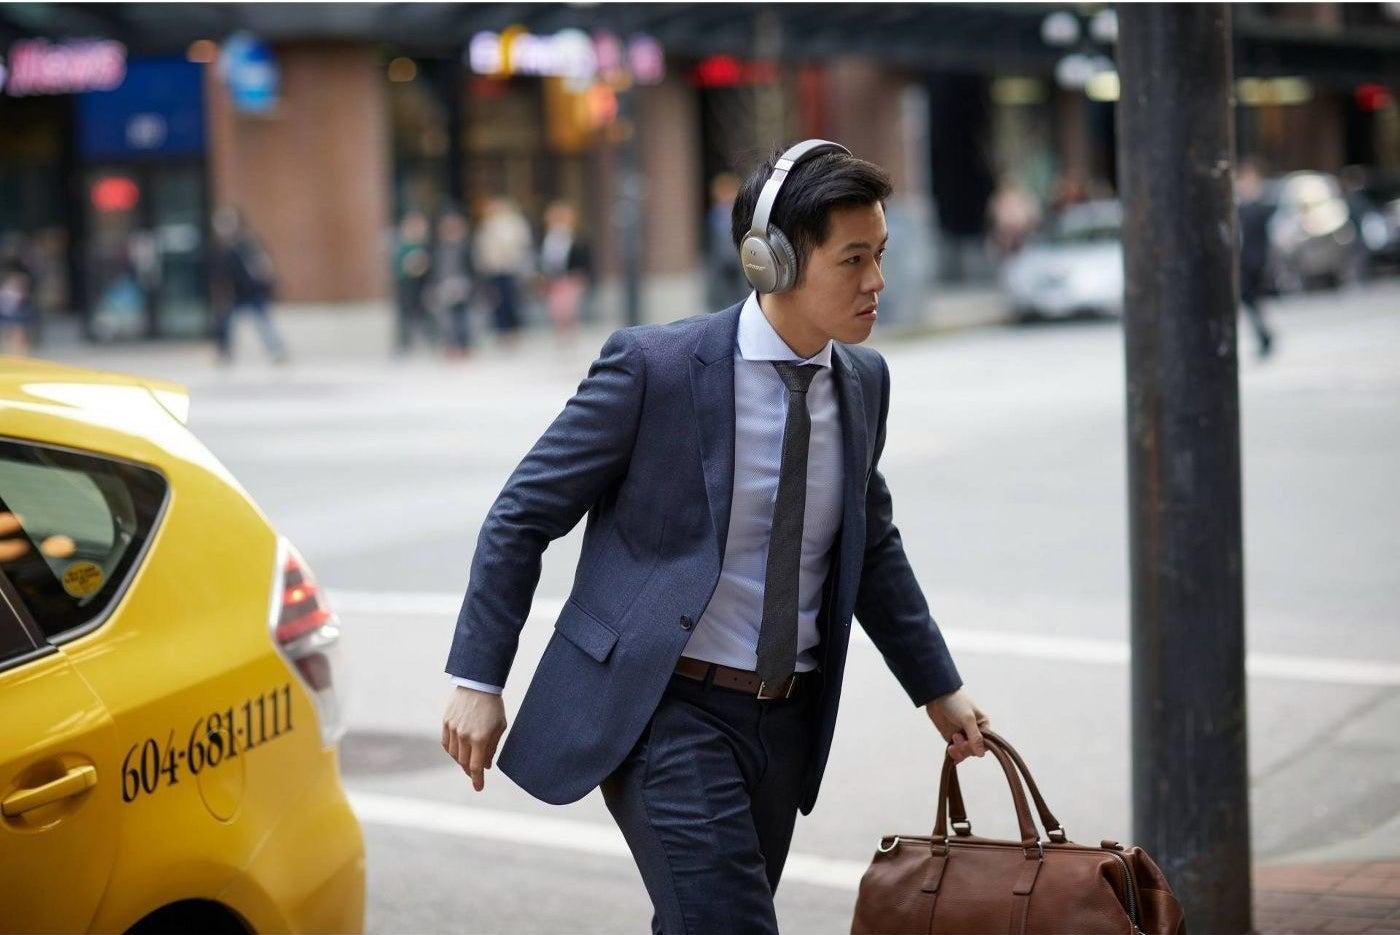 Model wearing noise-canceling headphones